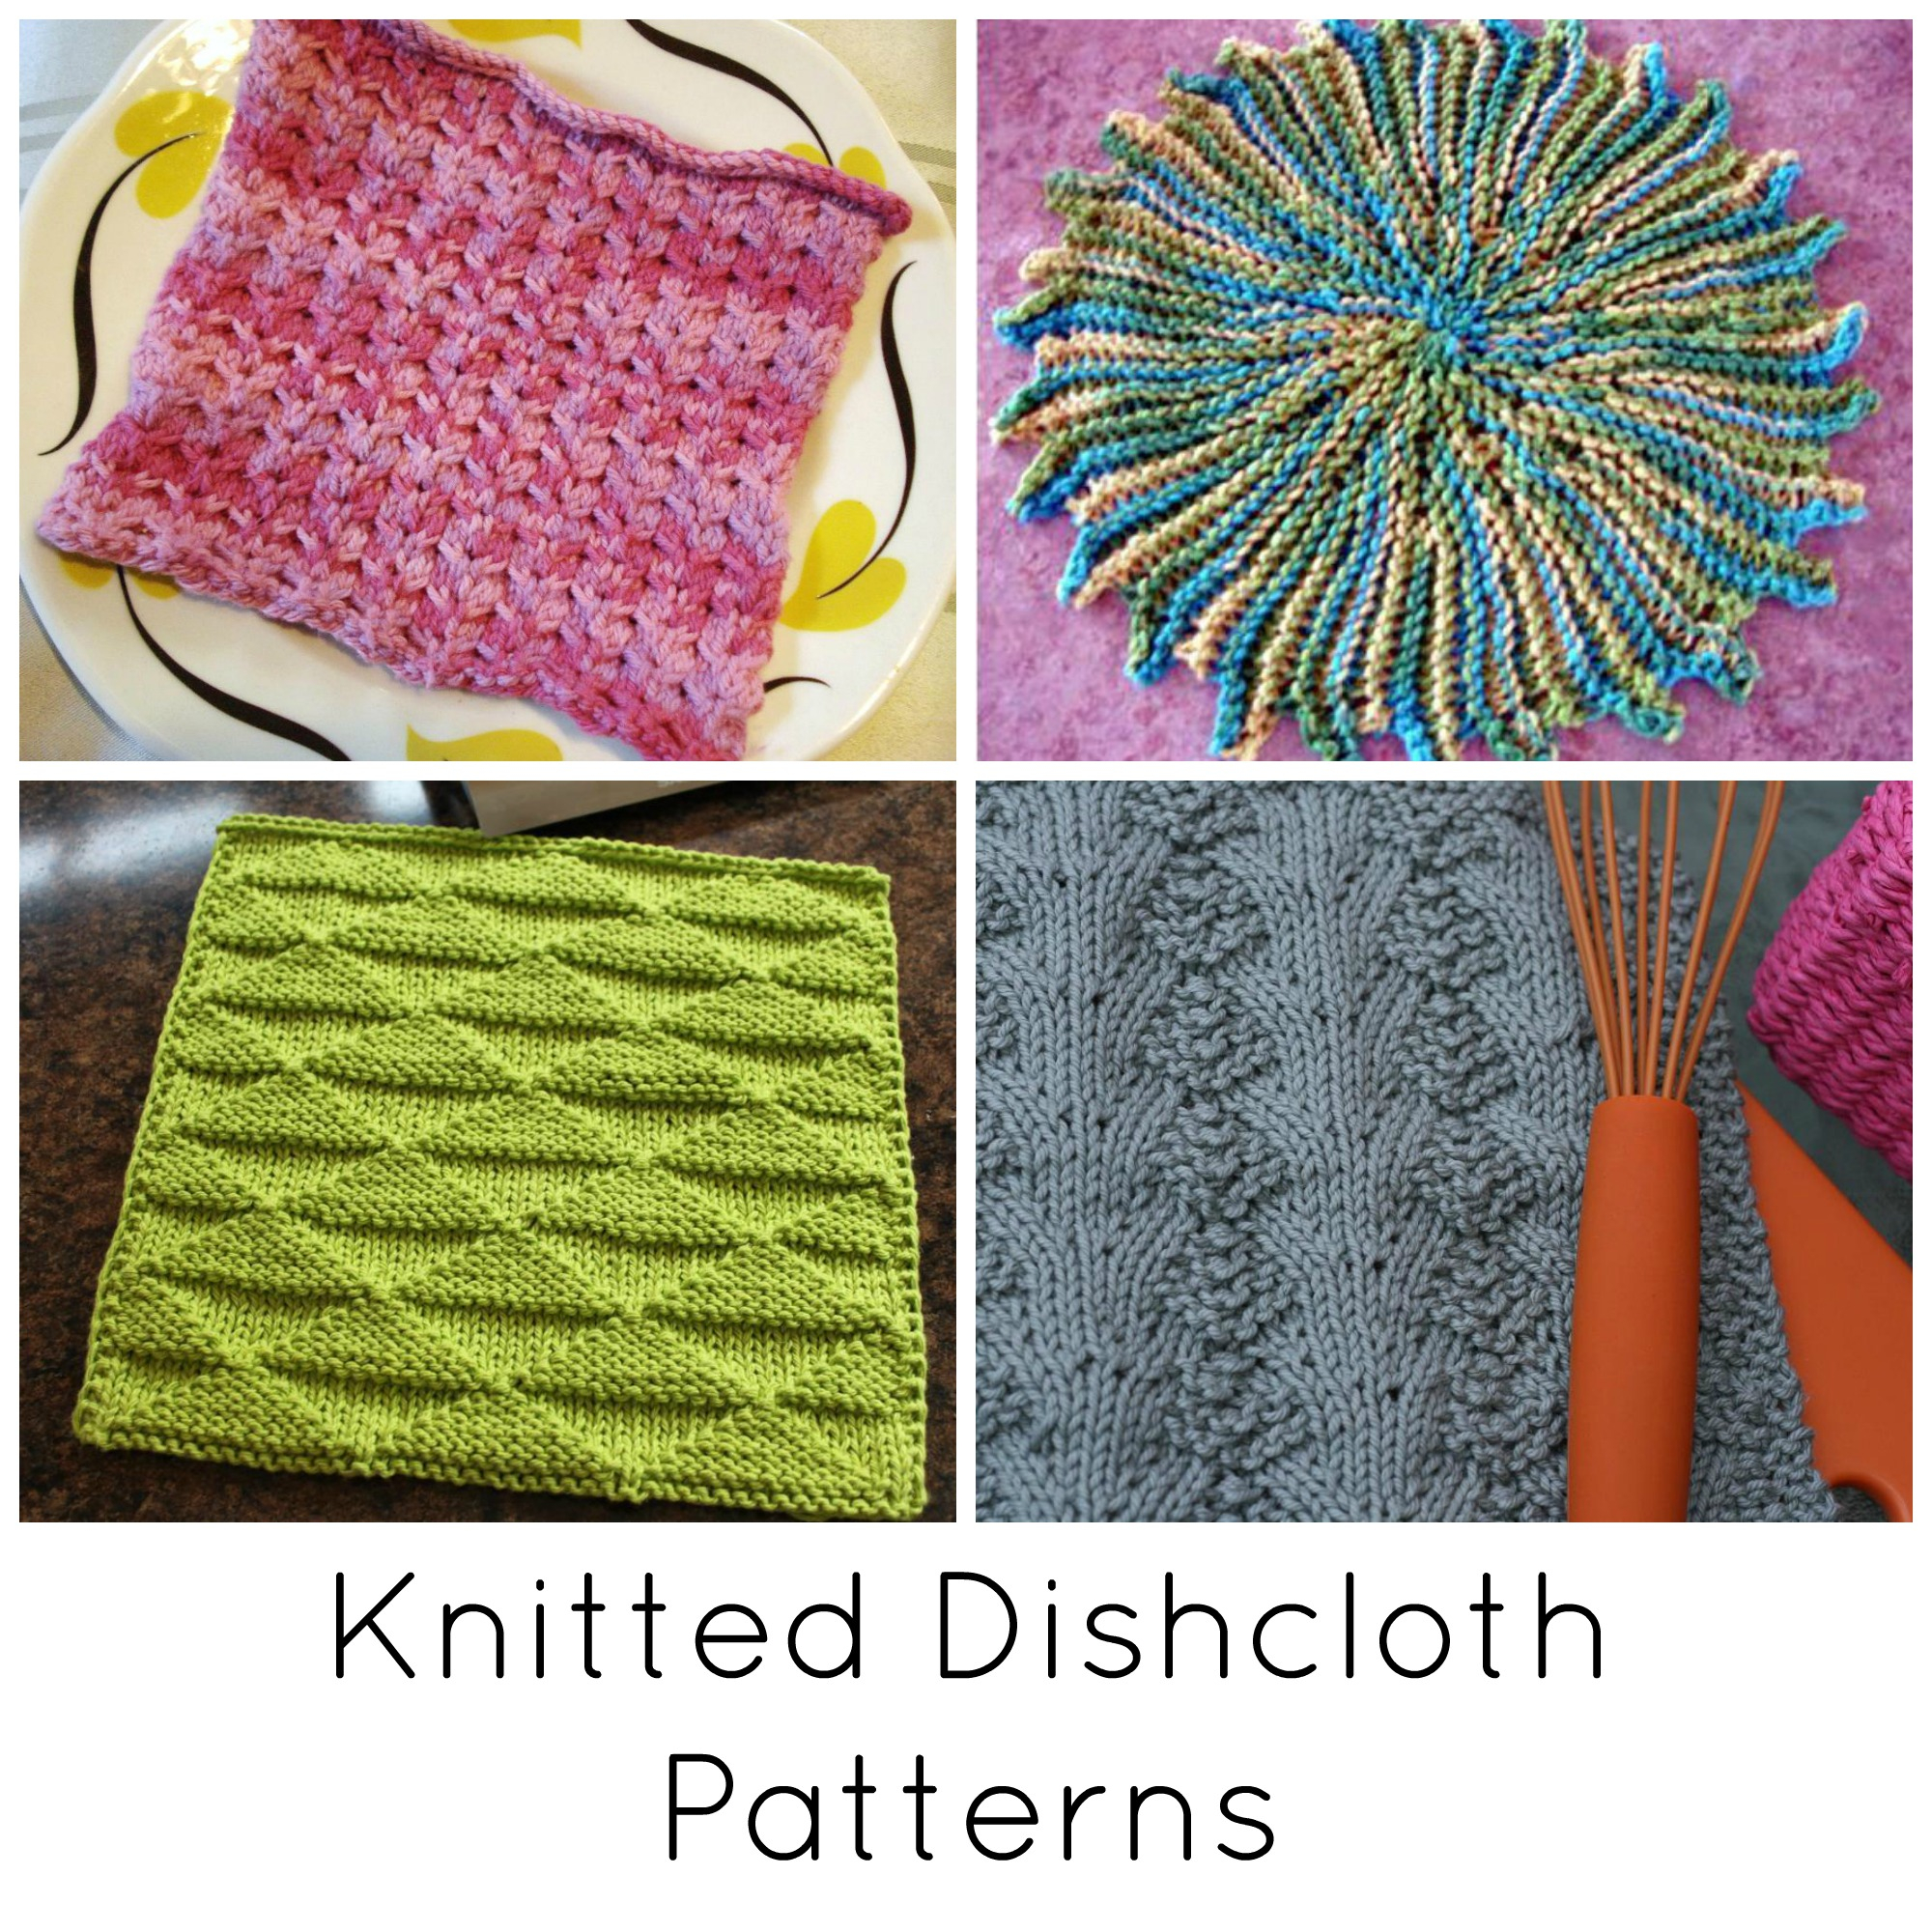 Washcloth Knitting Pattern 10 Quick Knitted Dishcloth Patterns